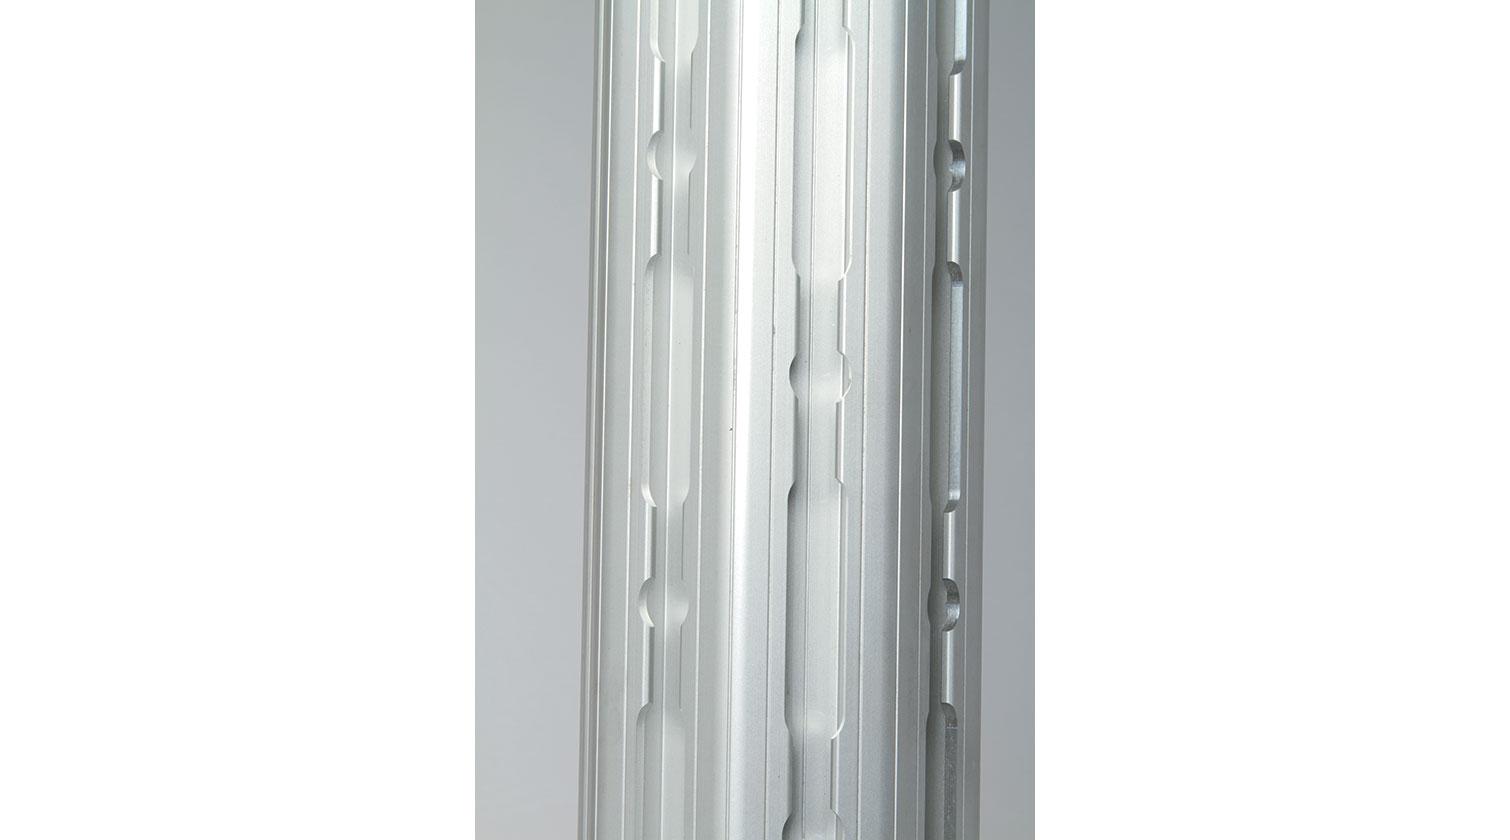 INT CNC Imes Icore GPV GPY aluminum sample